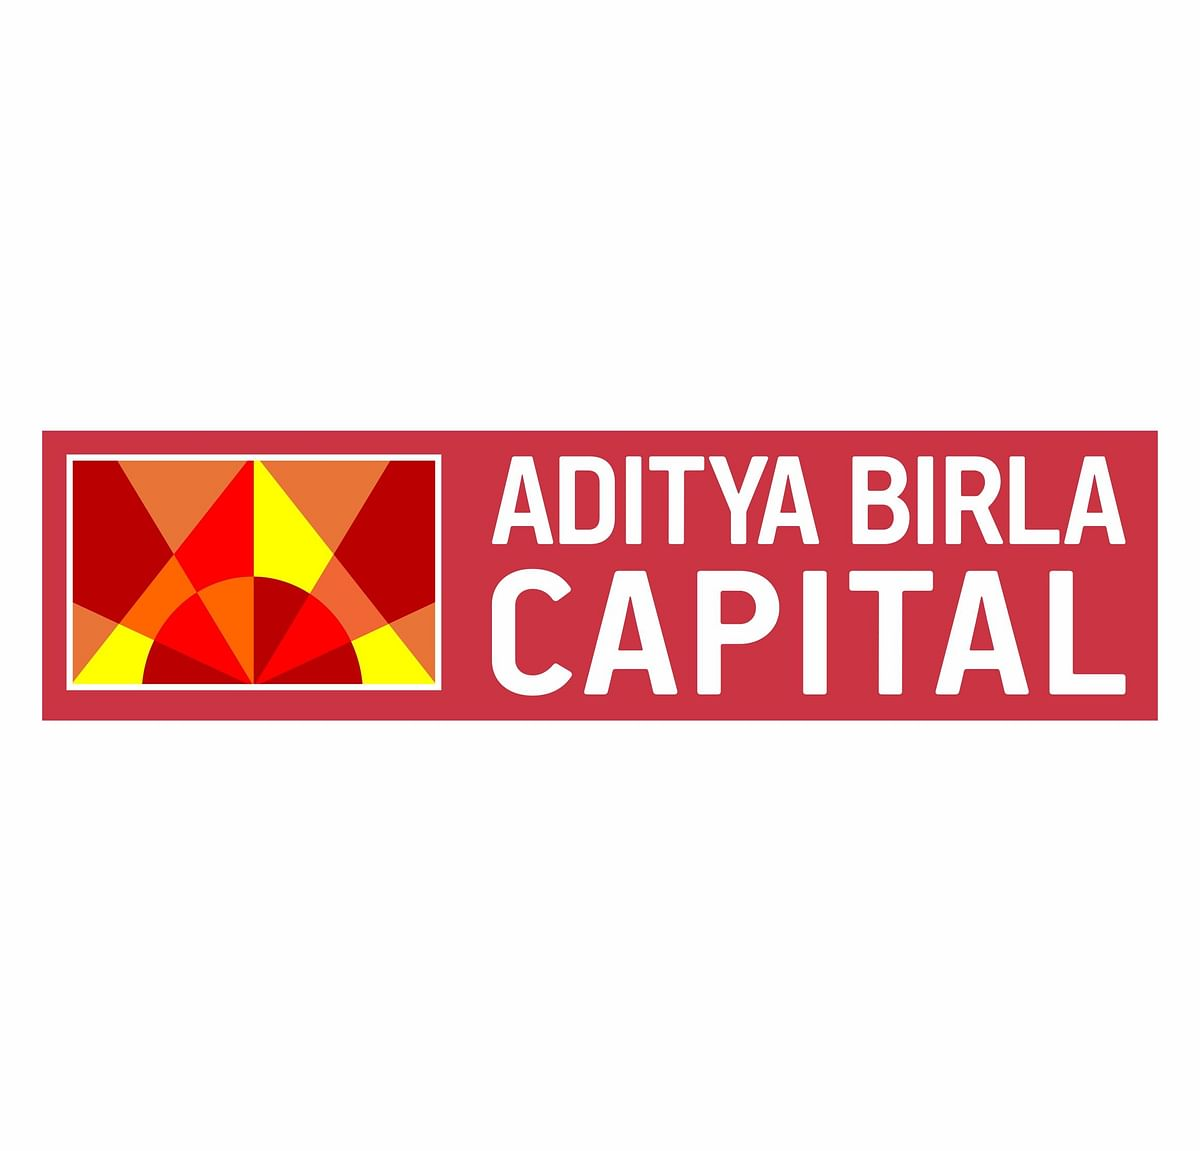 Aditya Birla Capital reports highest-ever net profit at Rs 302 cr in June quarter